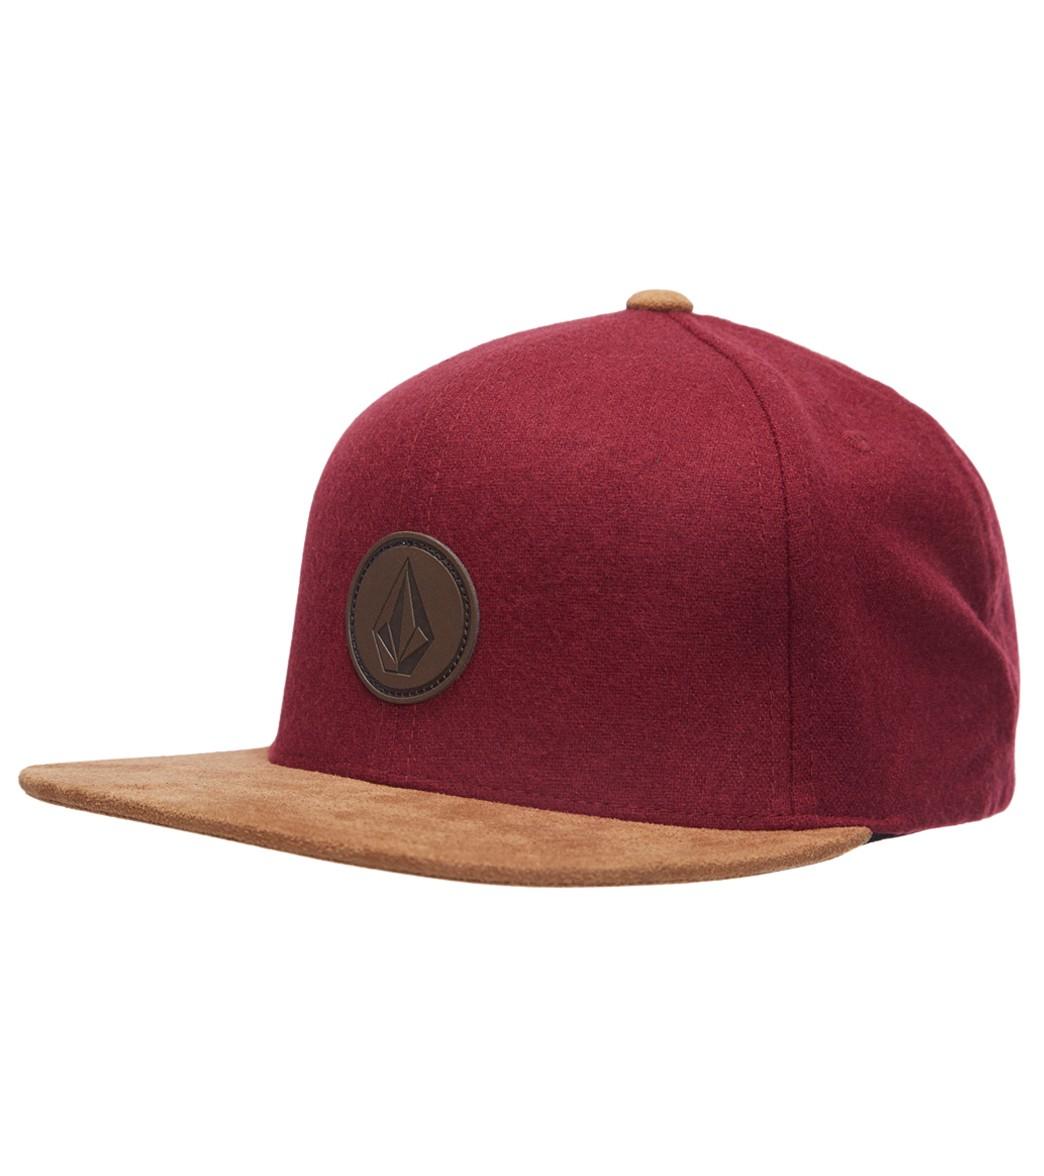 dacb0865a92 Volcom Men s Quarter Fabric Hat at SwimOutlet.com